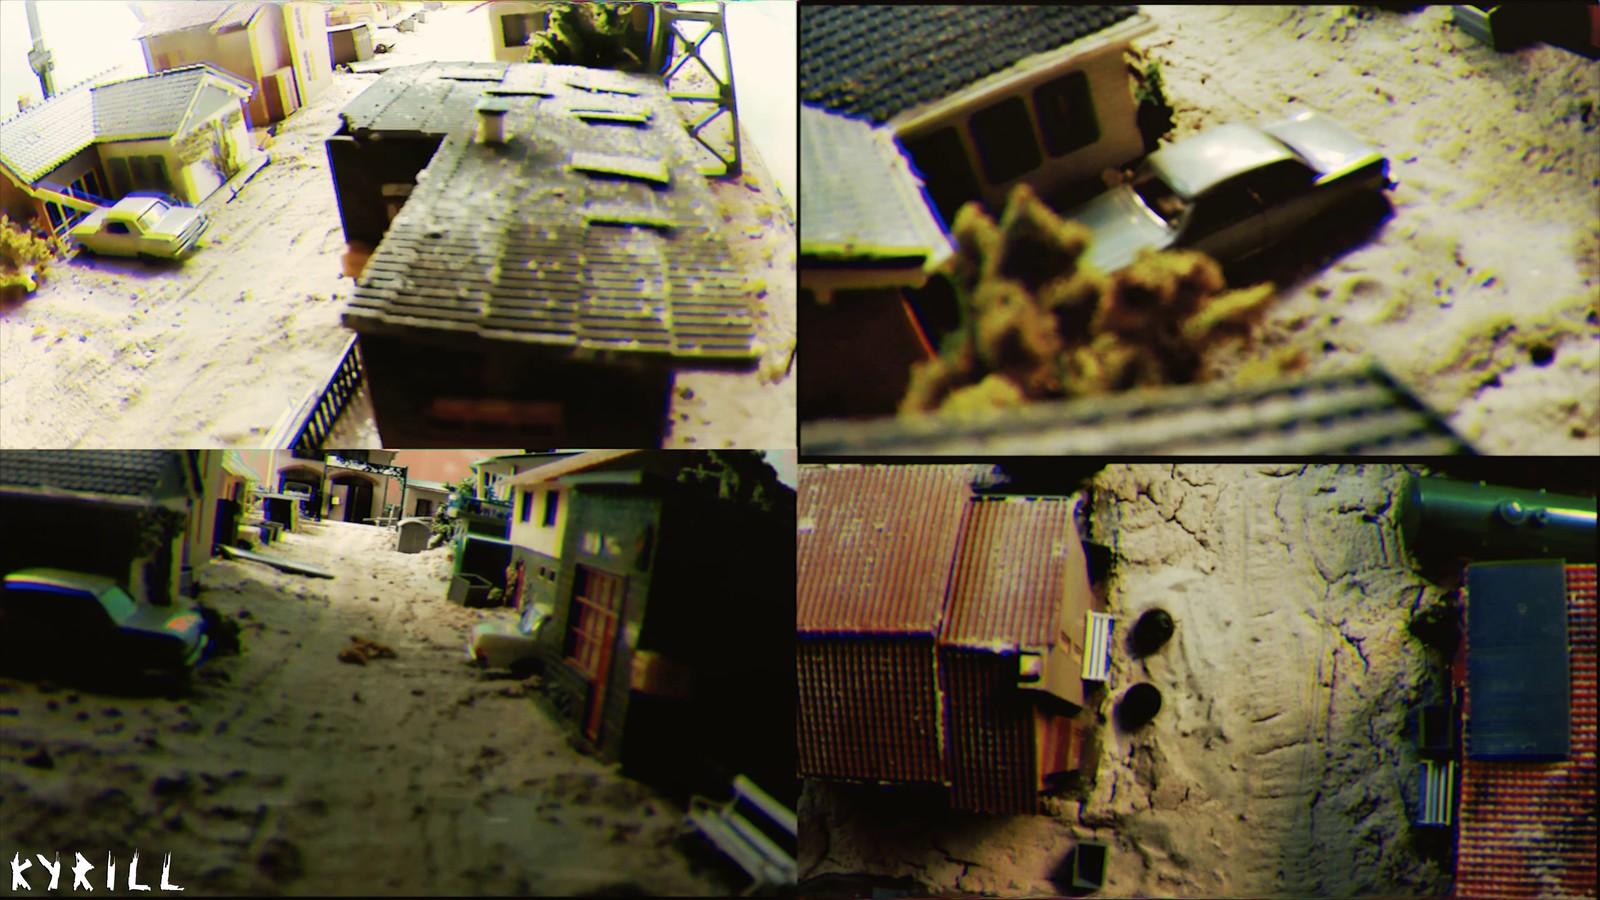 CCTV-like screencap from the short